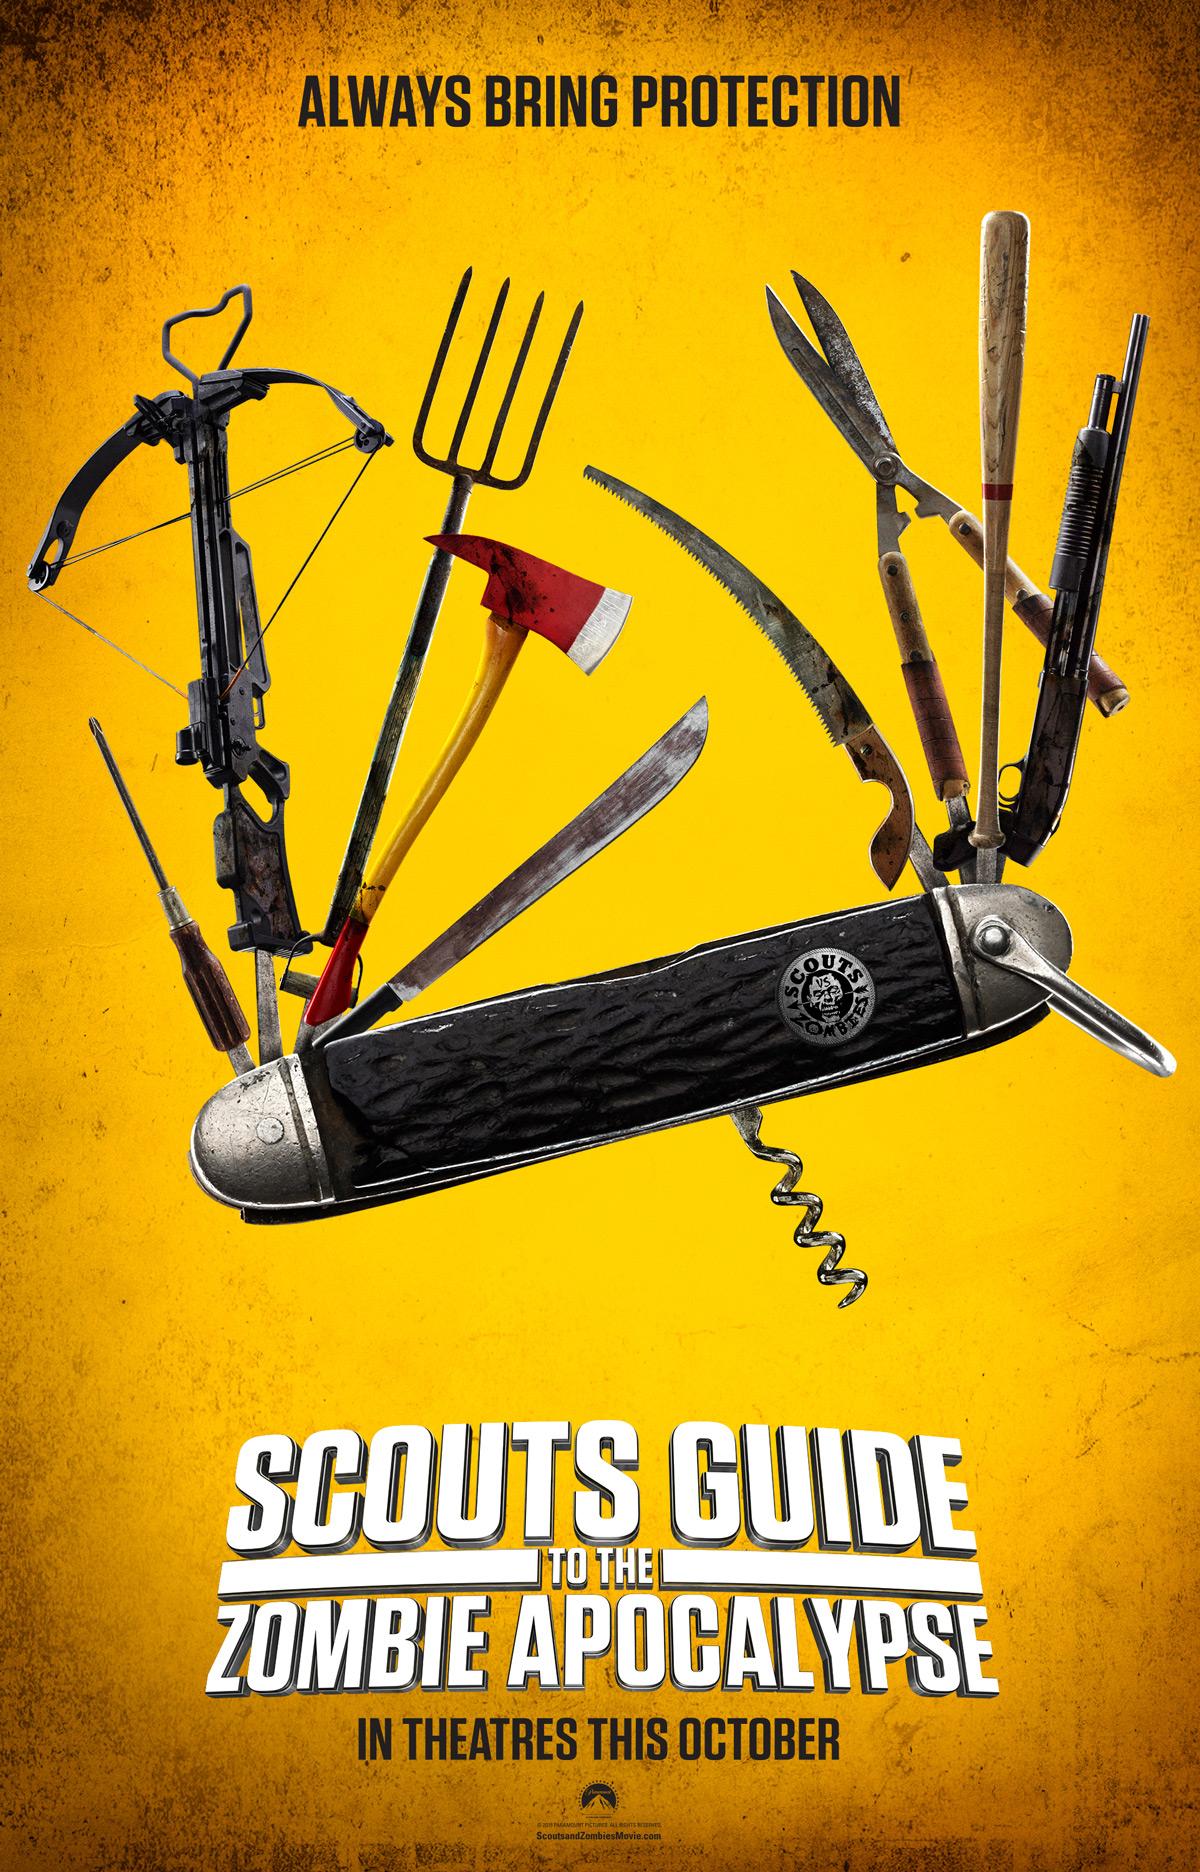 scoutsvszombies